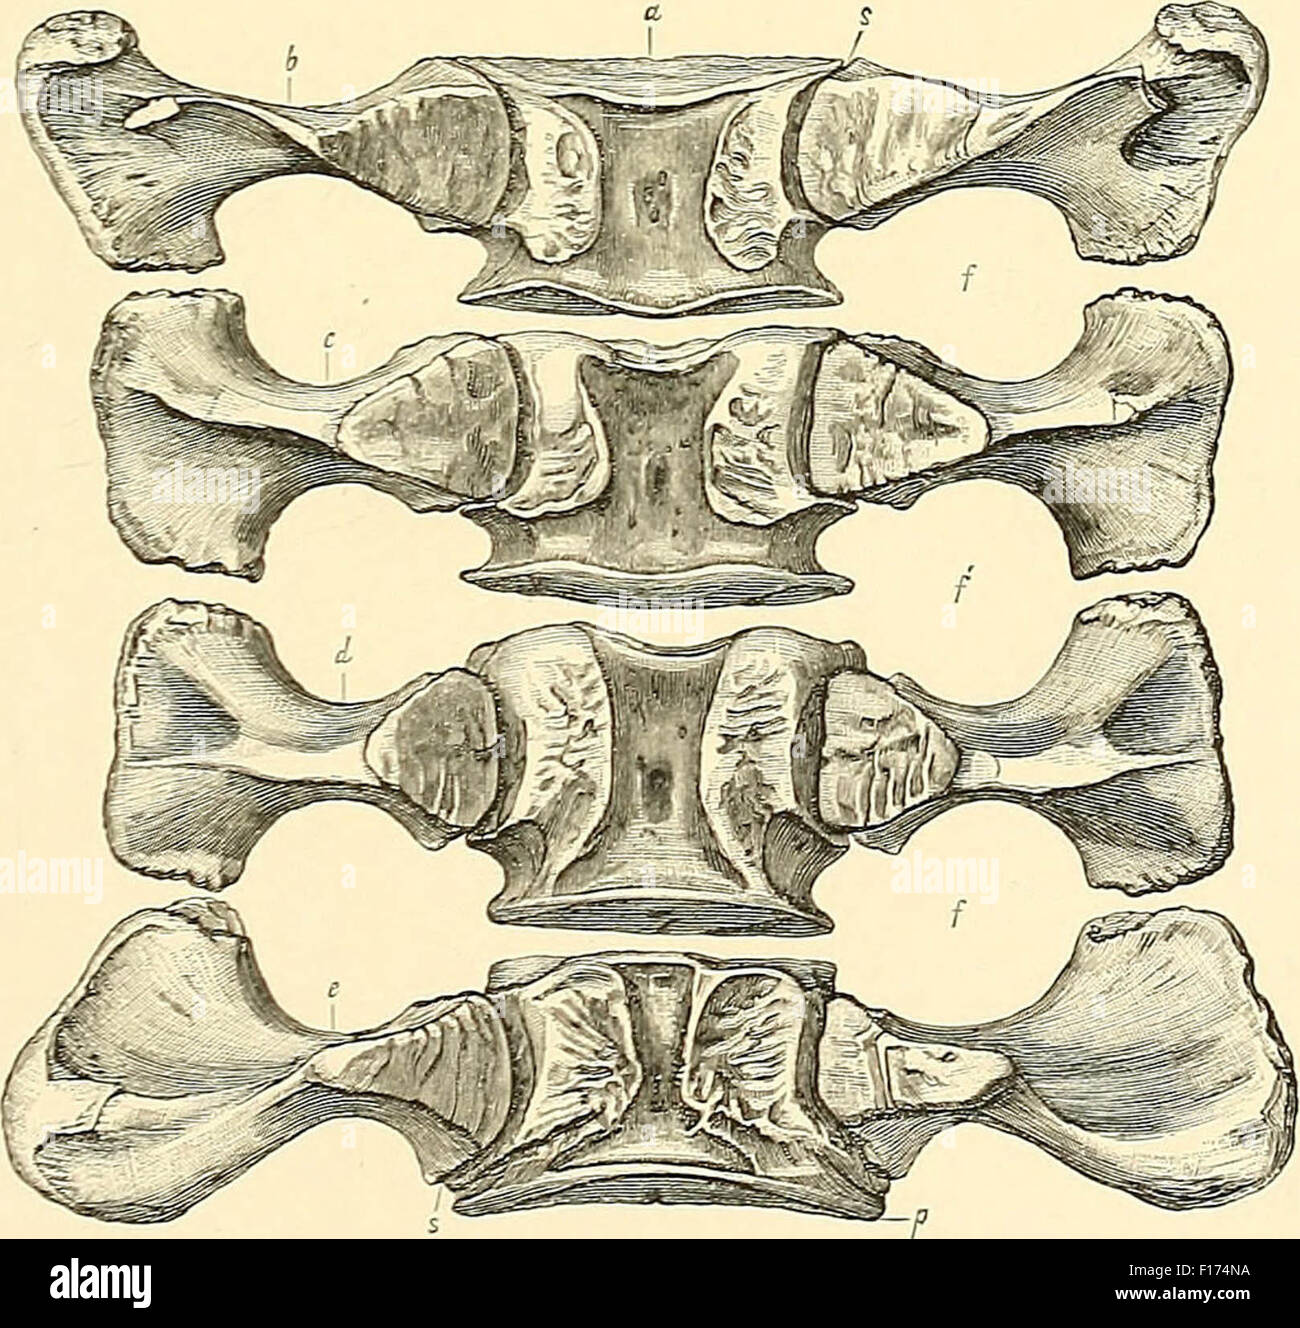 Dinosaur bones - Stock Image